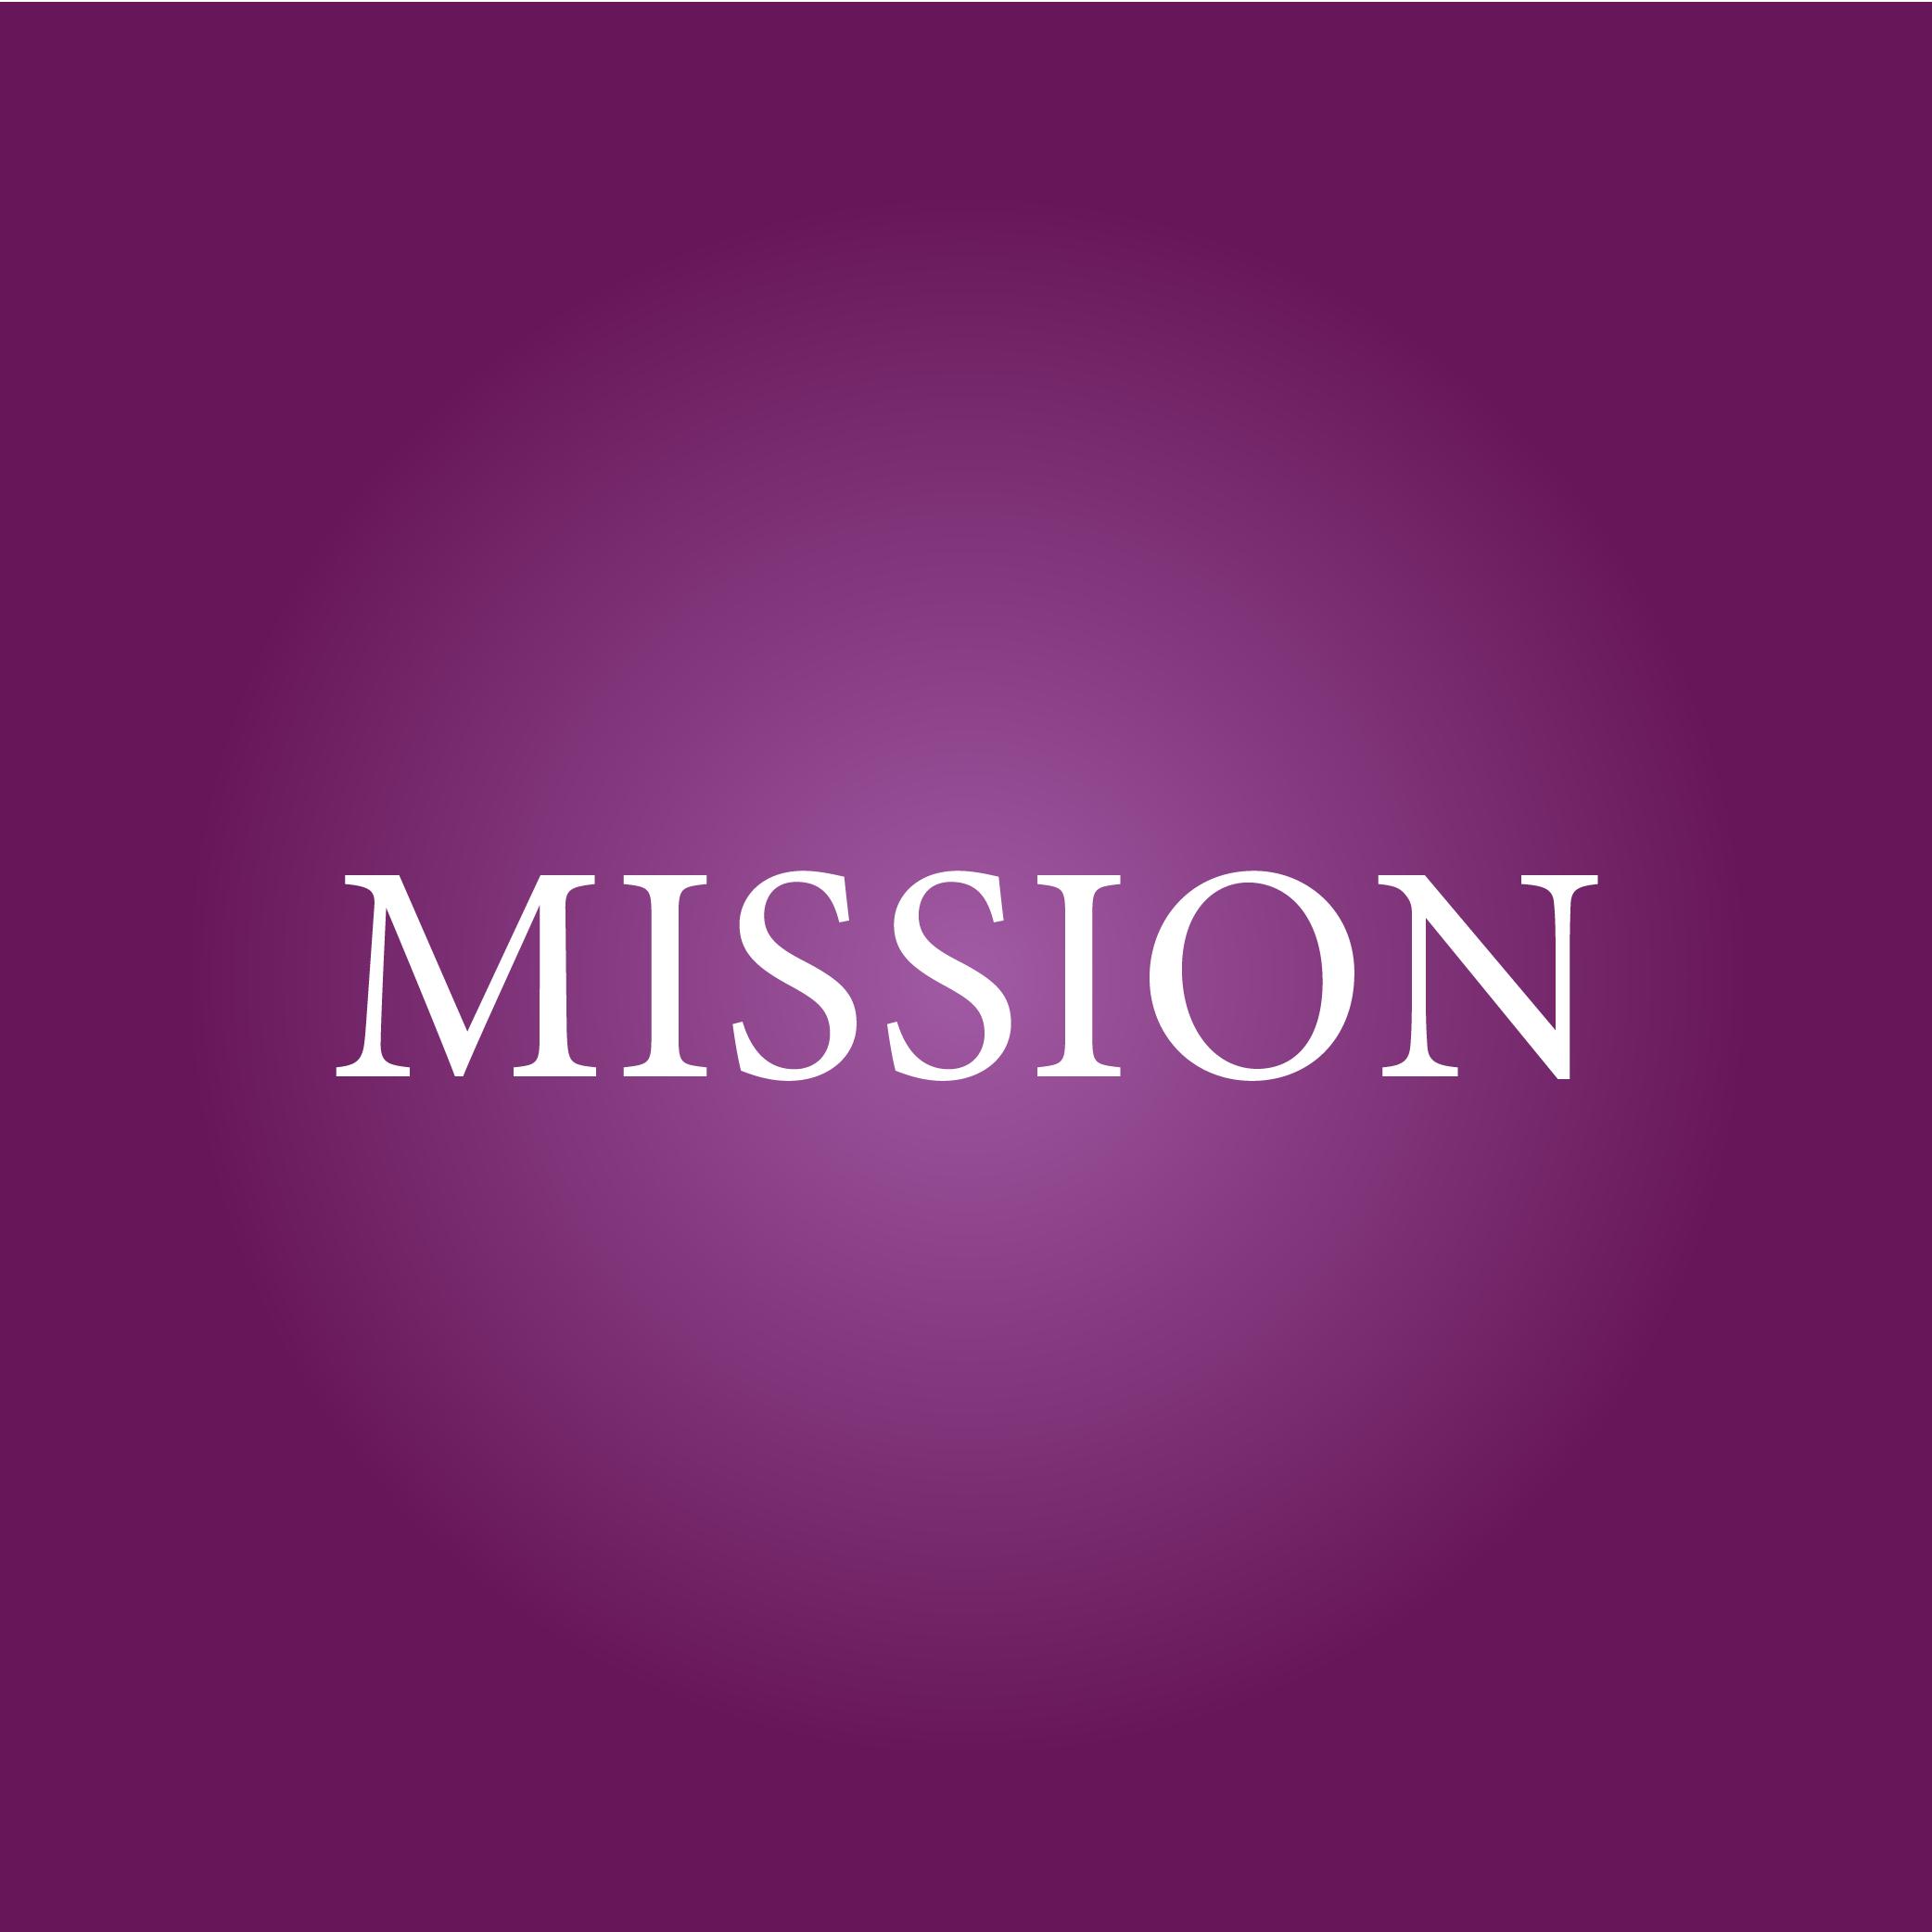 JT ICONS_MISSION 1